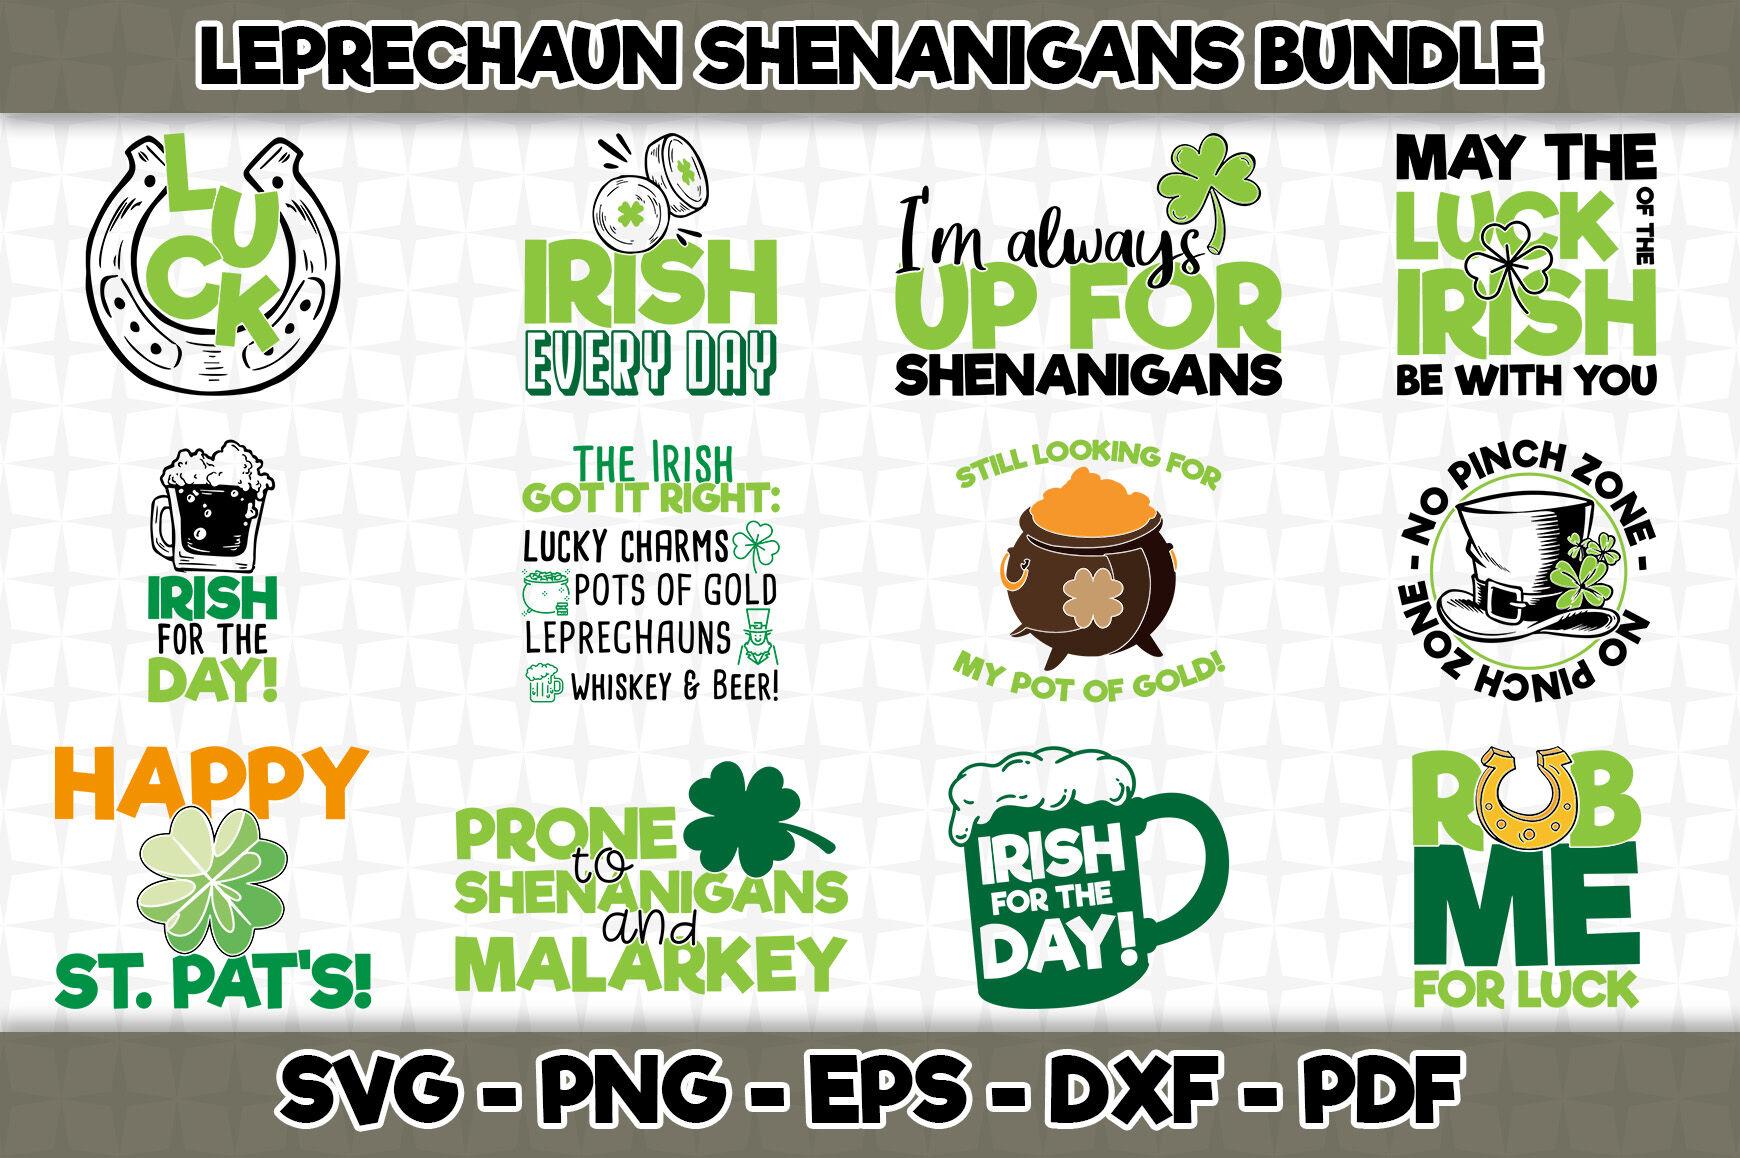 Leprechaun Shenanigans Svg Bundle 12 Designs Included By